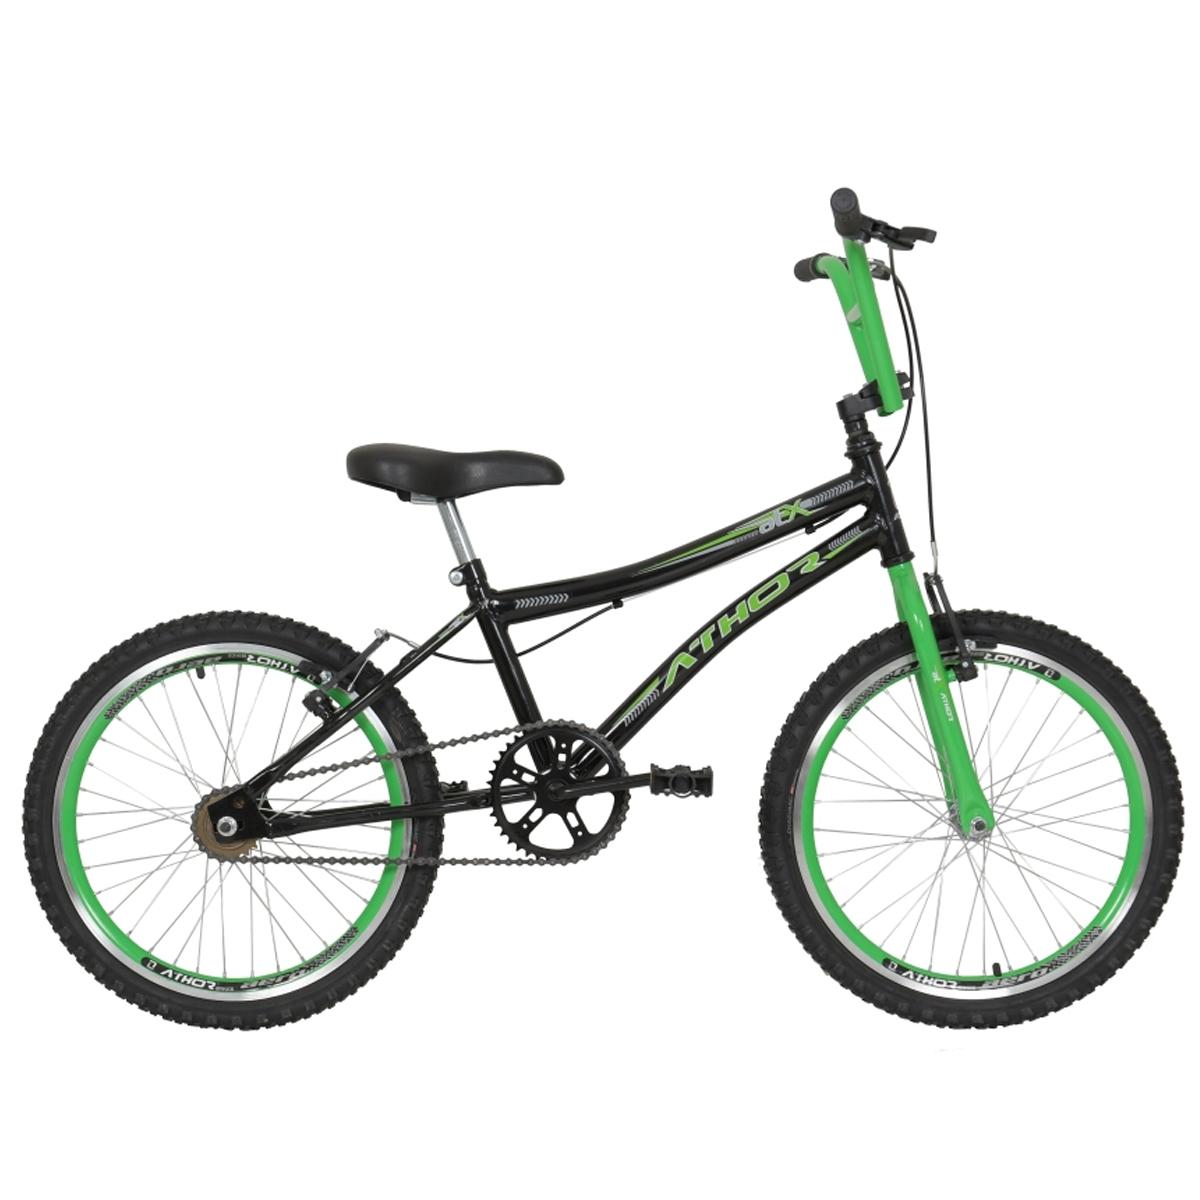 Bicicleta Infantil Aro 20 Athor Atx Masculino Sem Marcha